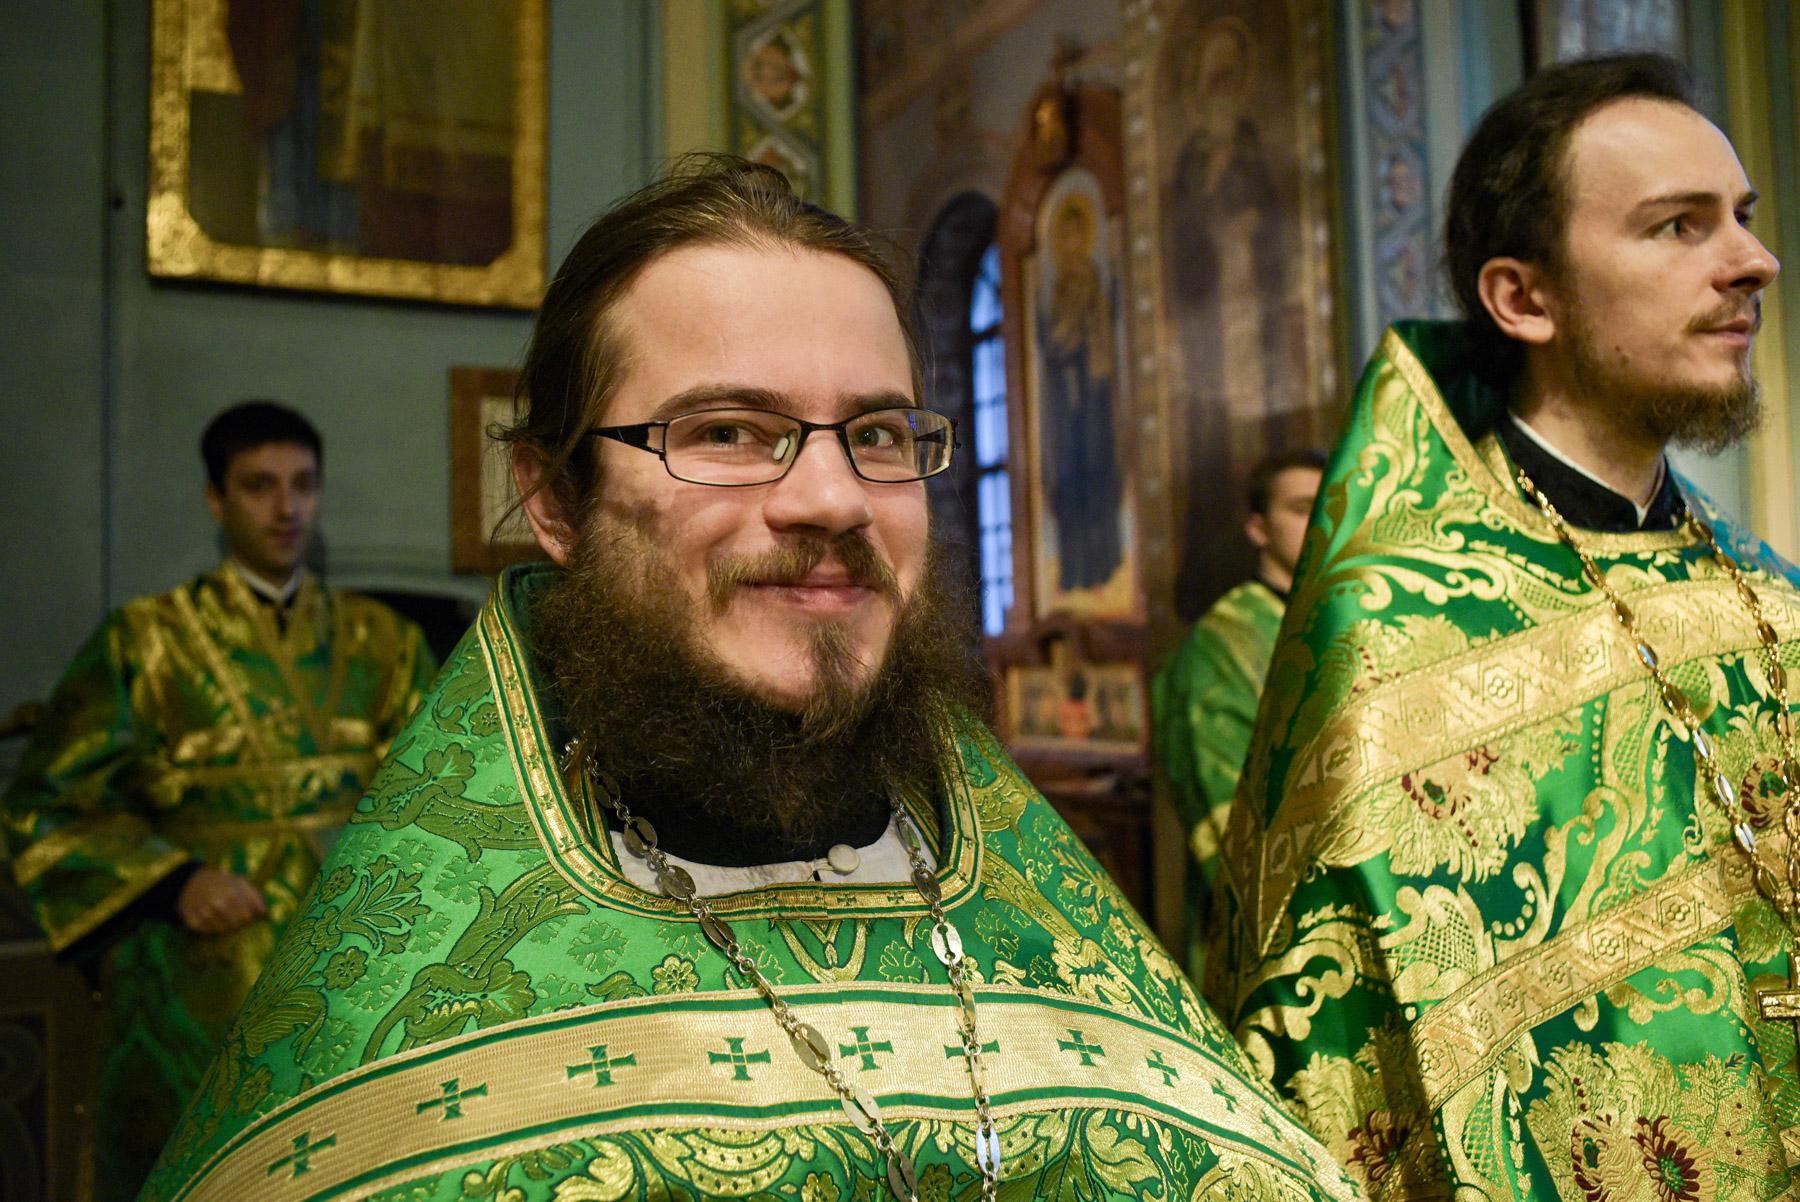 photos of orthodox christmas 0124 2